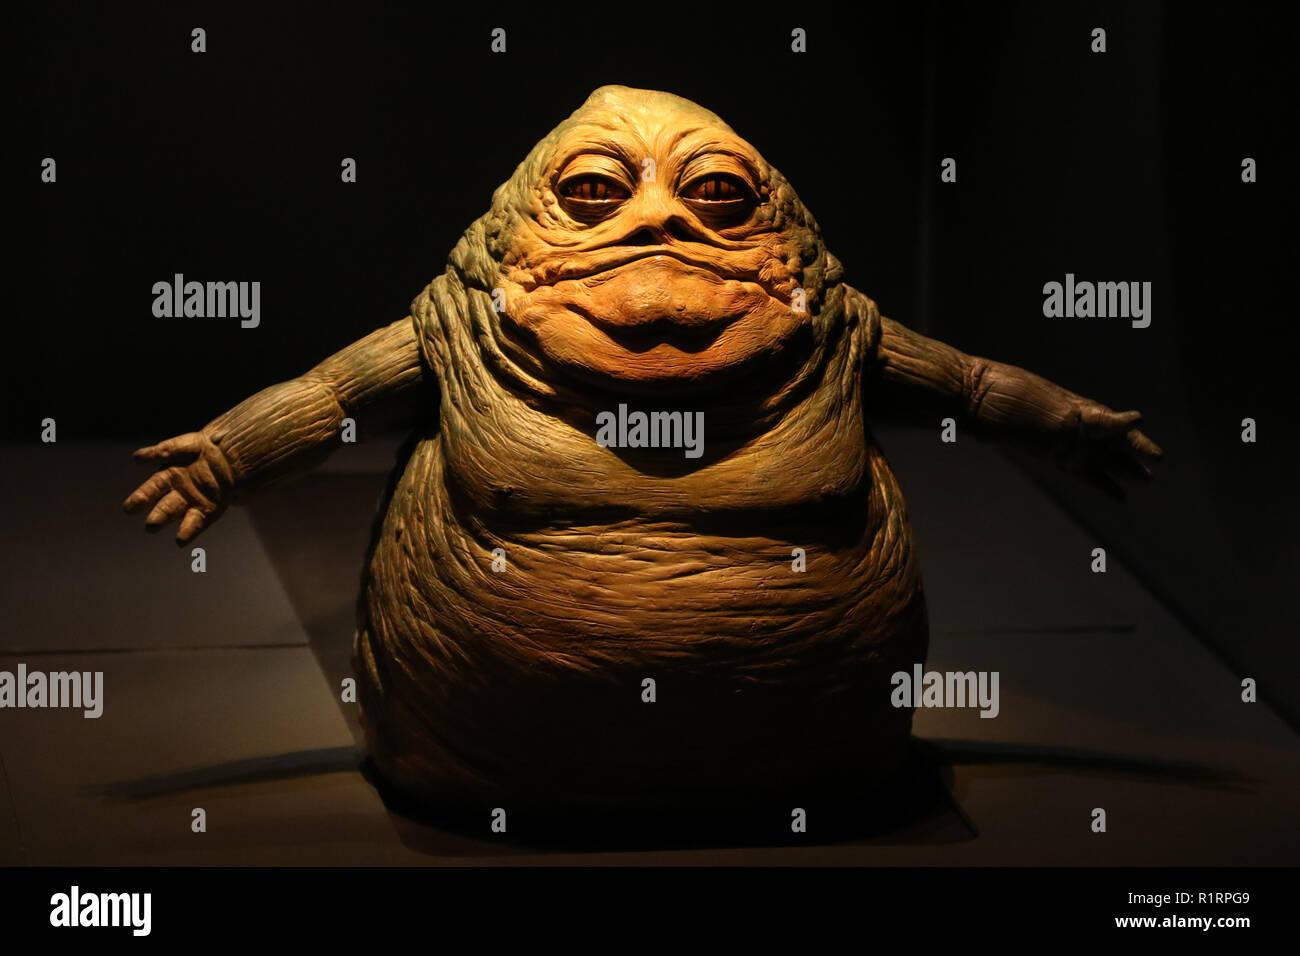 Jabba The Hutt Stock Photos Amp Jabba The Hutt Stock Images